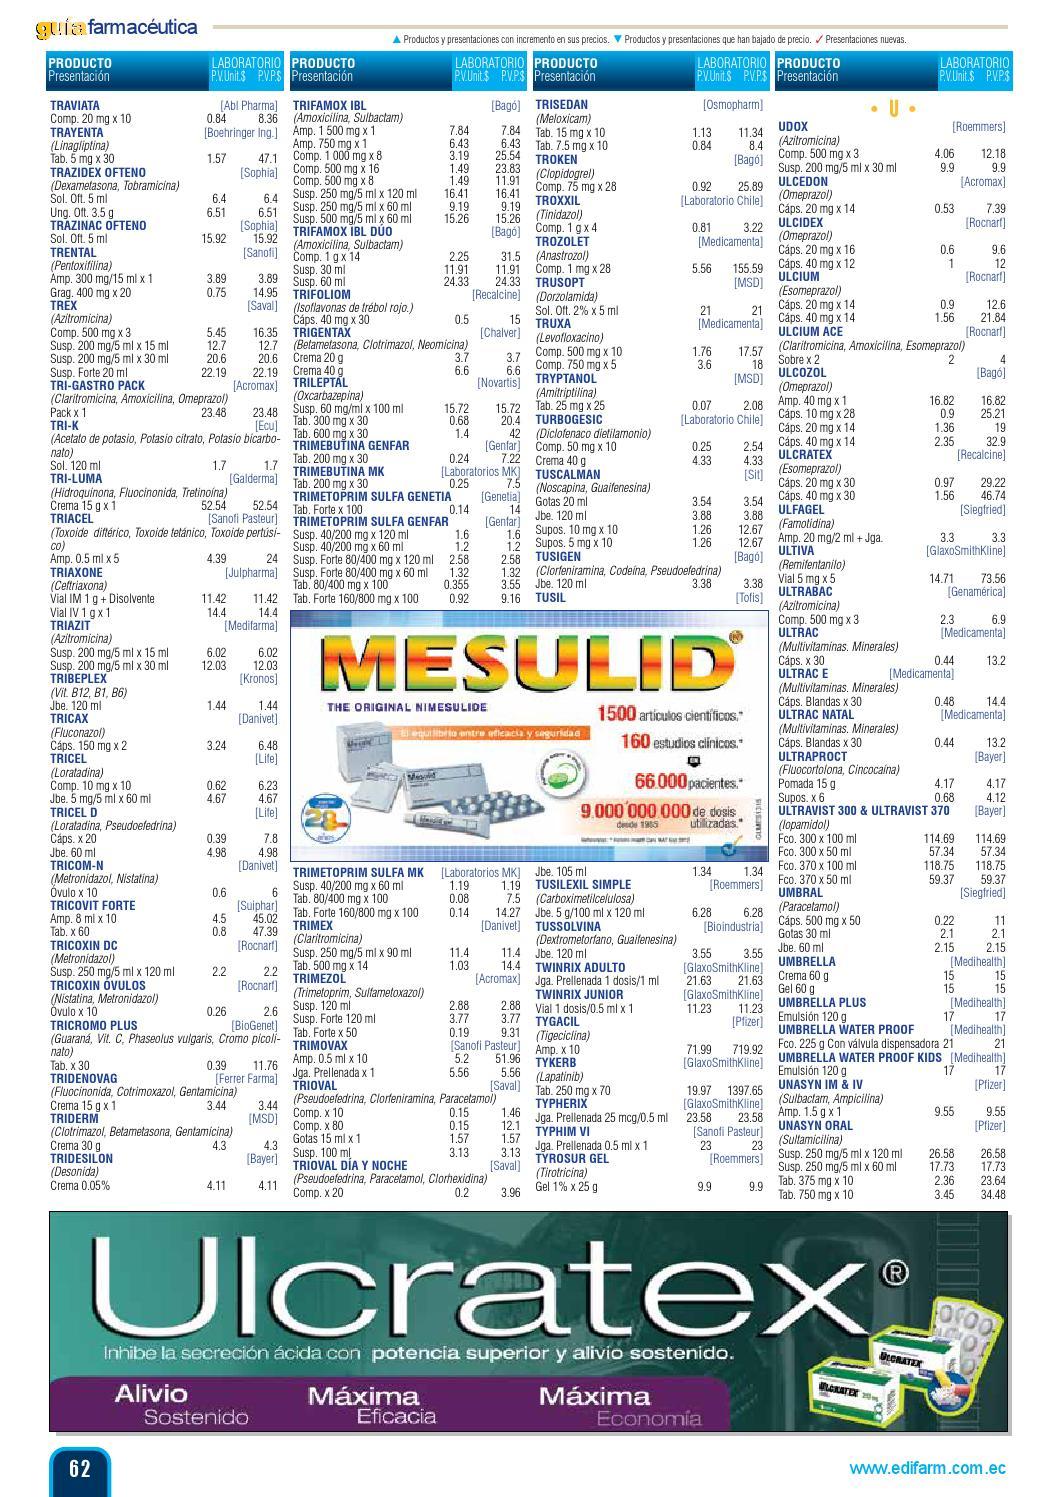 Where can i buy priligy hydrochloride